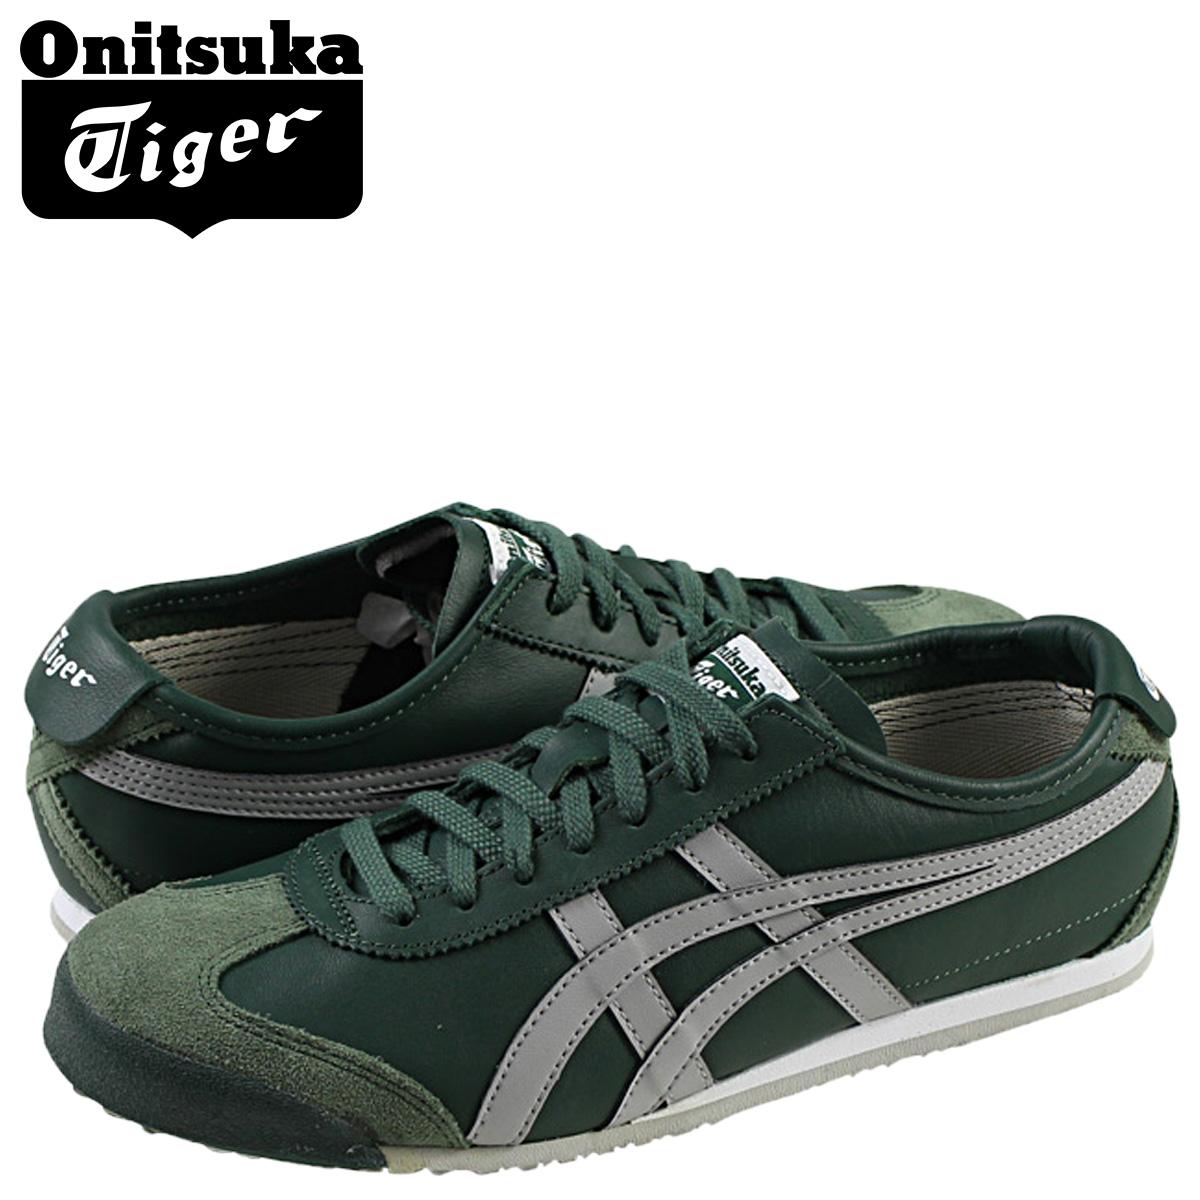 new style 8ec07 e1554 Onitsuka tiger Onitsuka Tiger Mexico 66 asics sneakers men gap Dis MEXICO  66 TH4J2L-8013 green